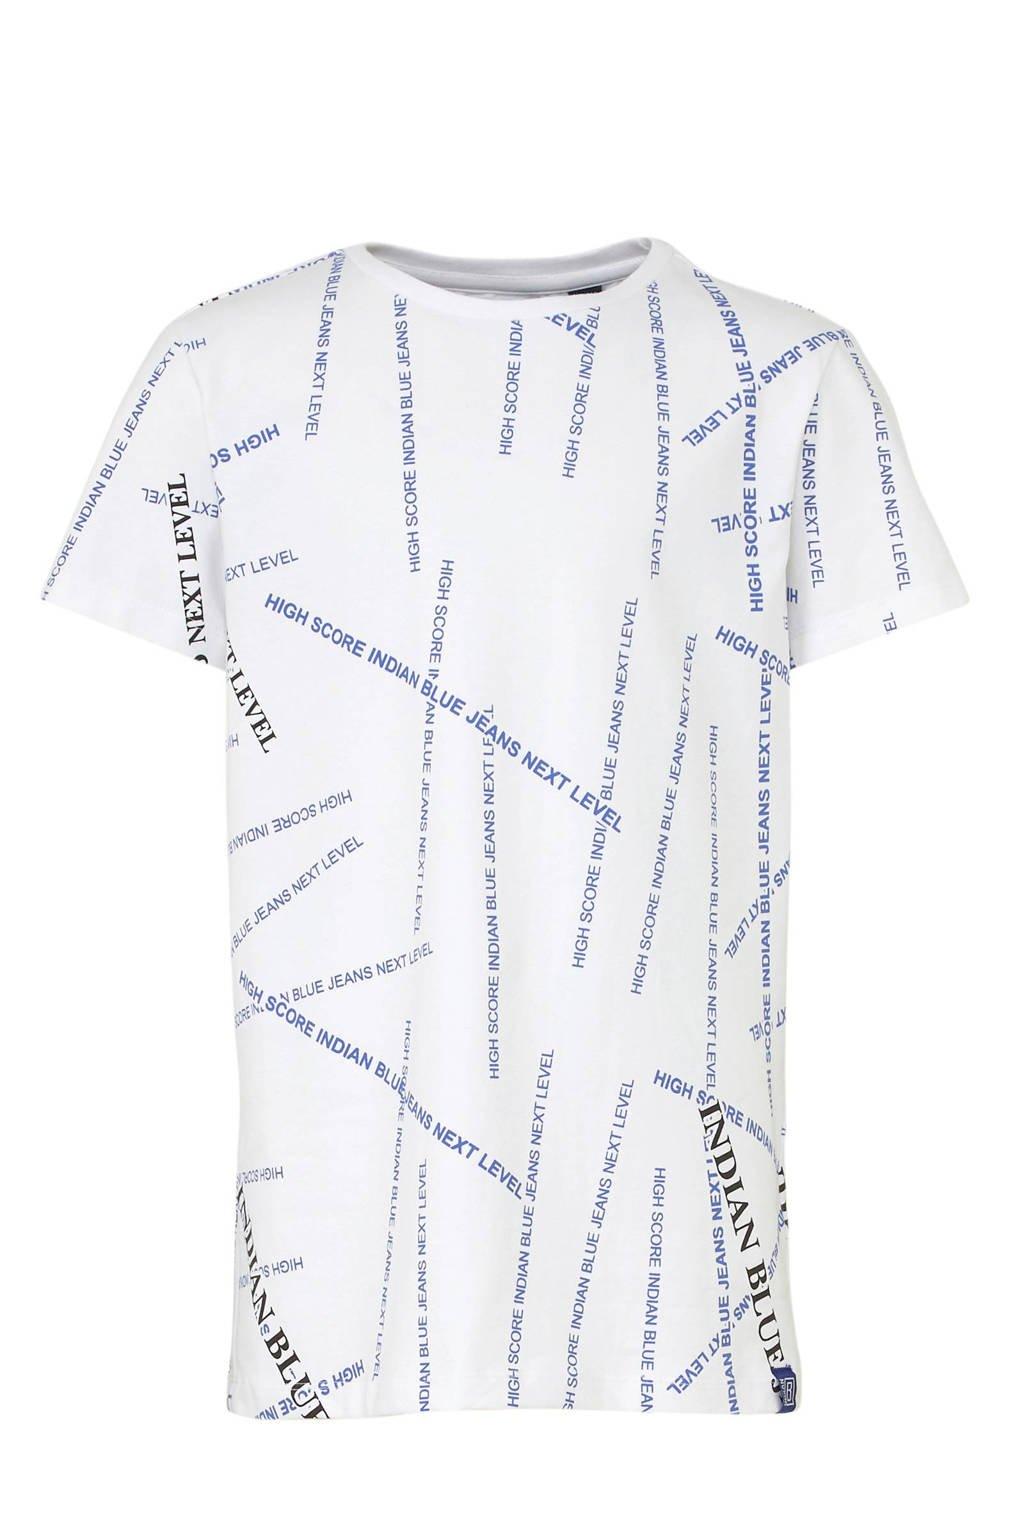 Indian Blue Jeans T-shirt met all over print wit/blauw/zwart, Wit/blauw/zwart